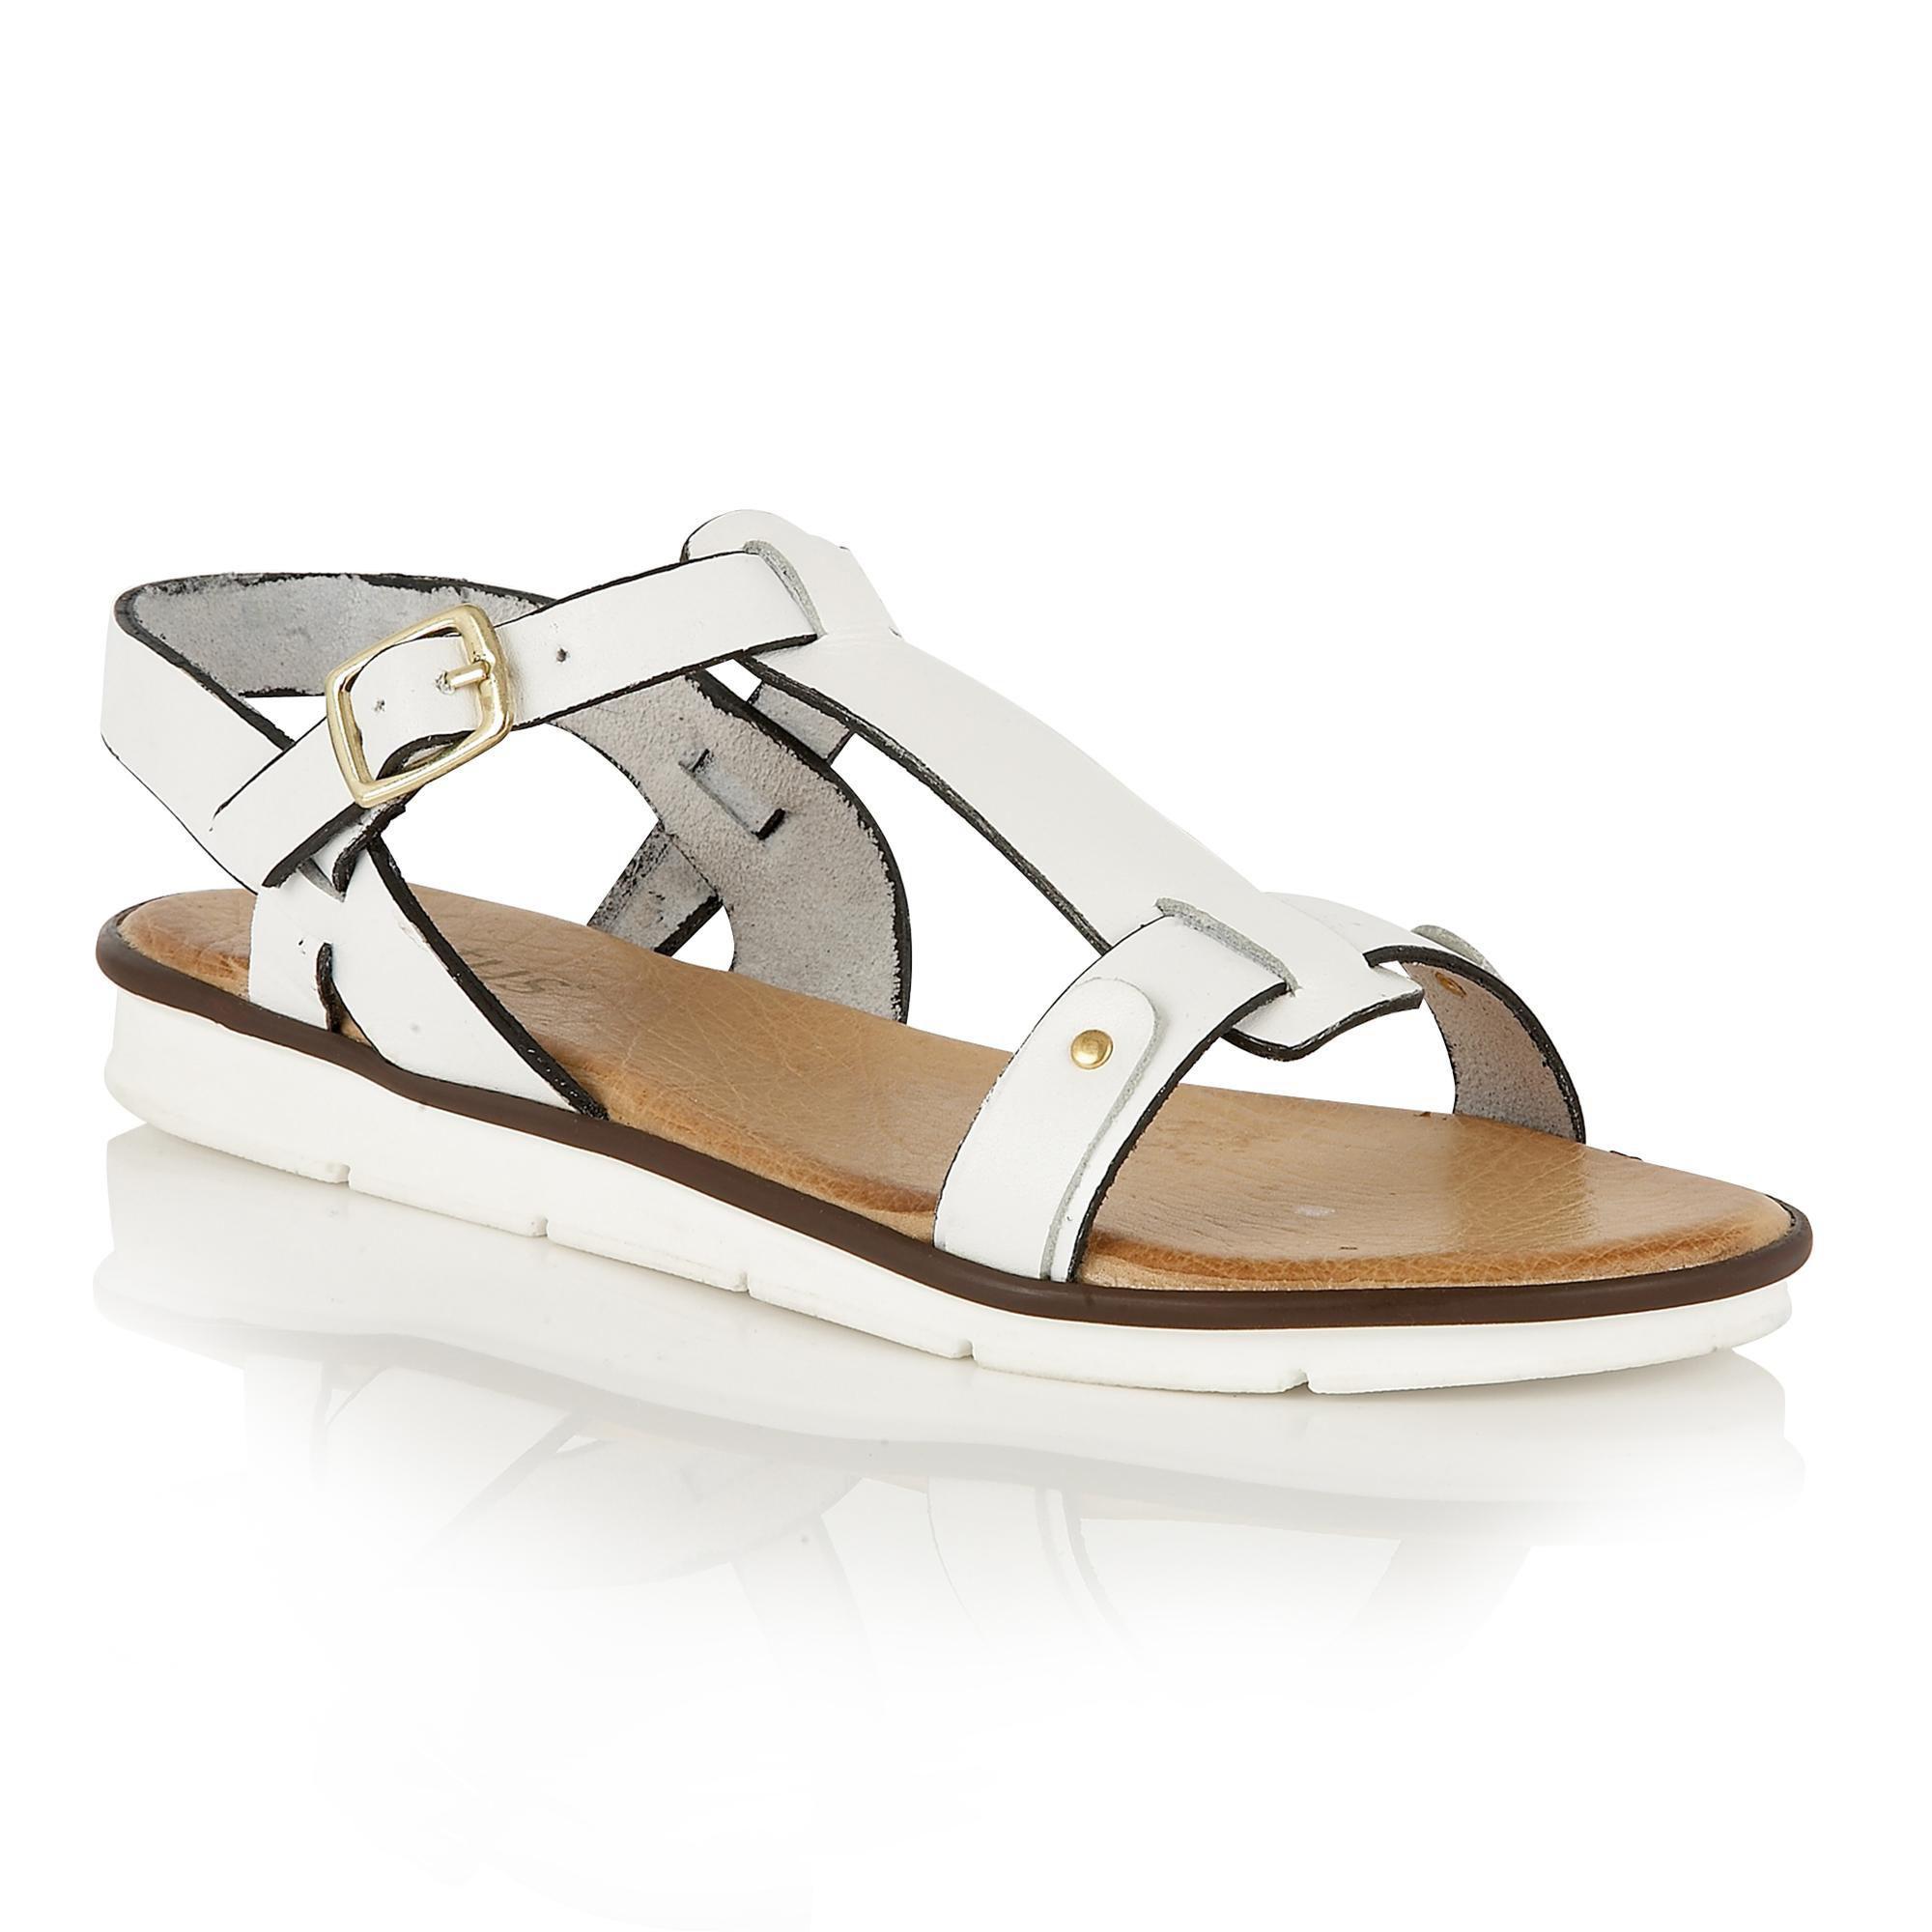 FOOTWEAR - Toe post sandals Aerin nrMBifgr